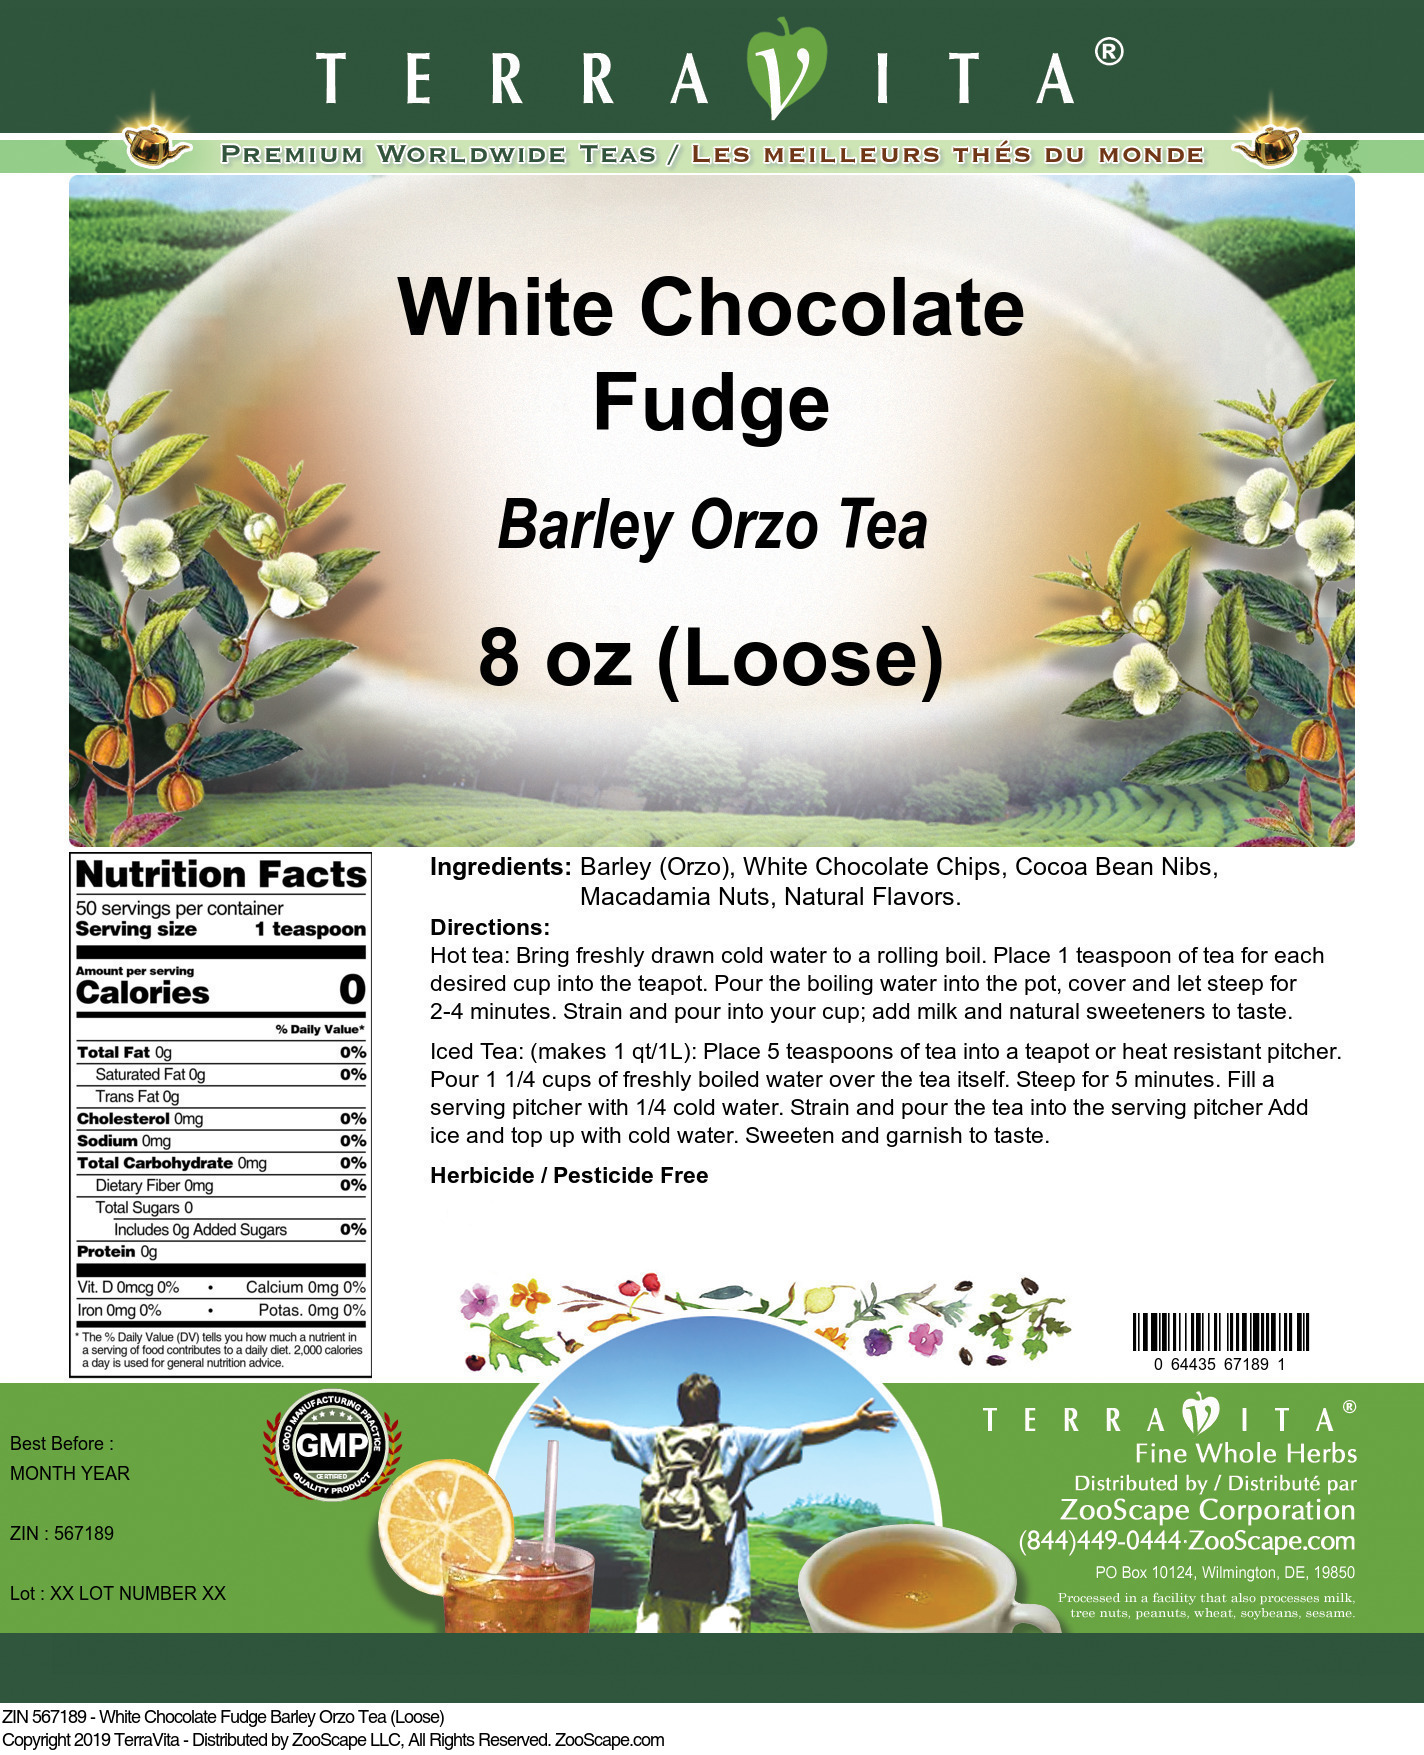 White Chocolate Fudge Barley Orzo Tea (Loose)